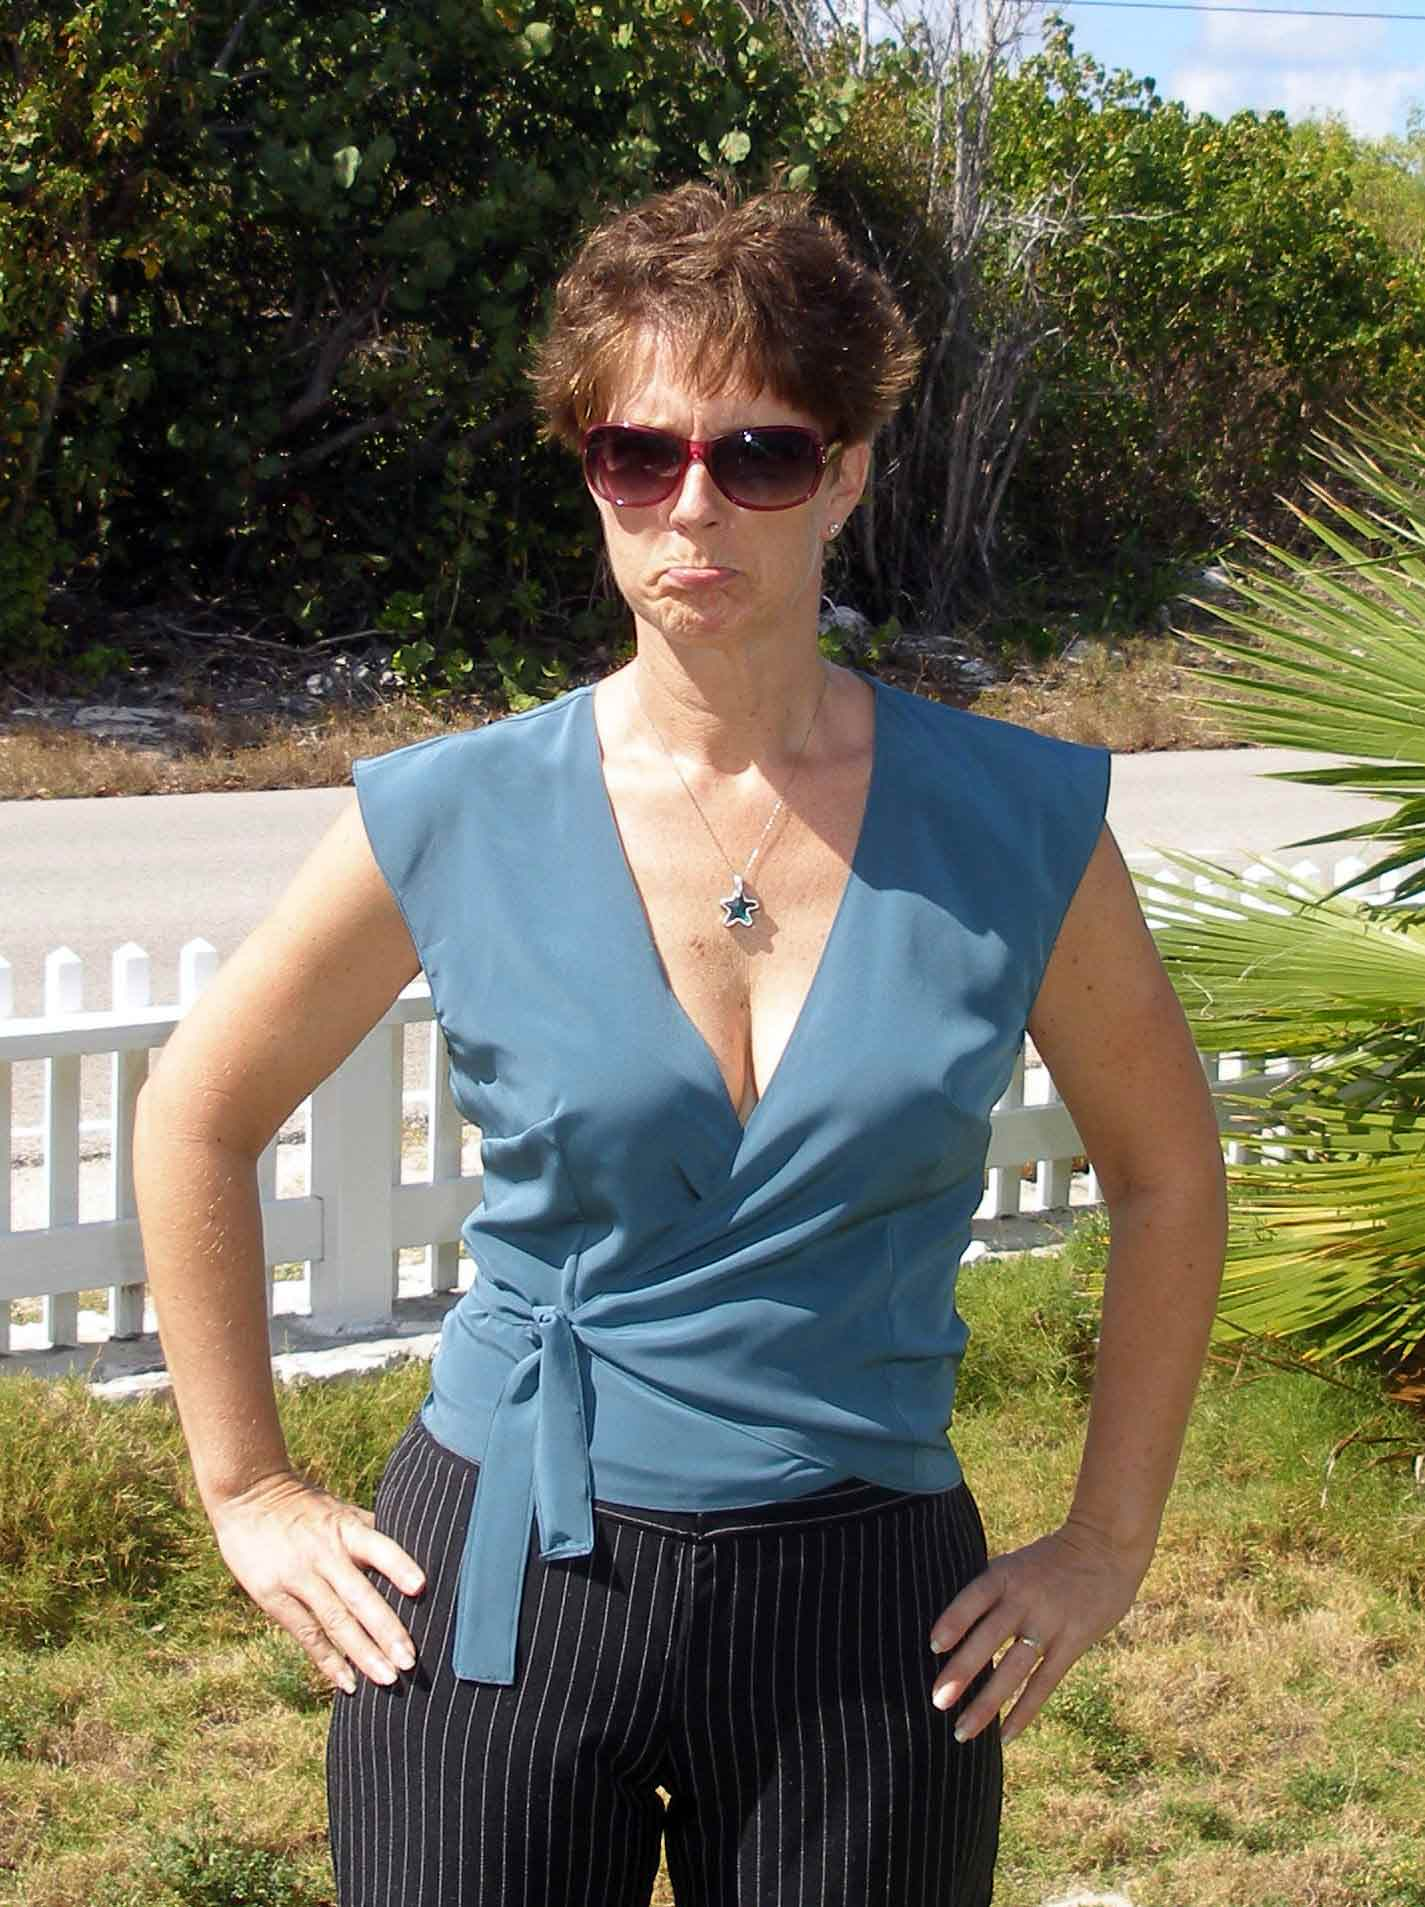 So Sew Easy: Free pattern, Wrap blouse failure